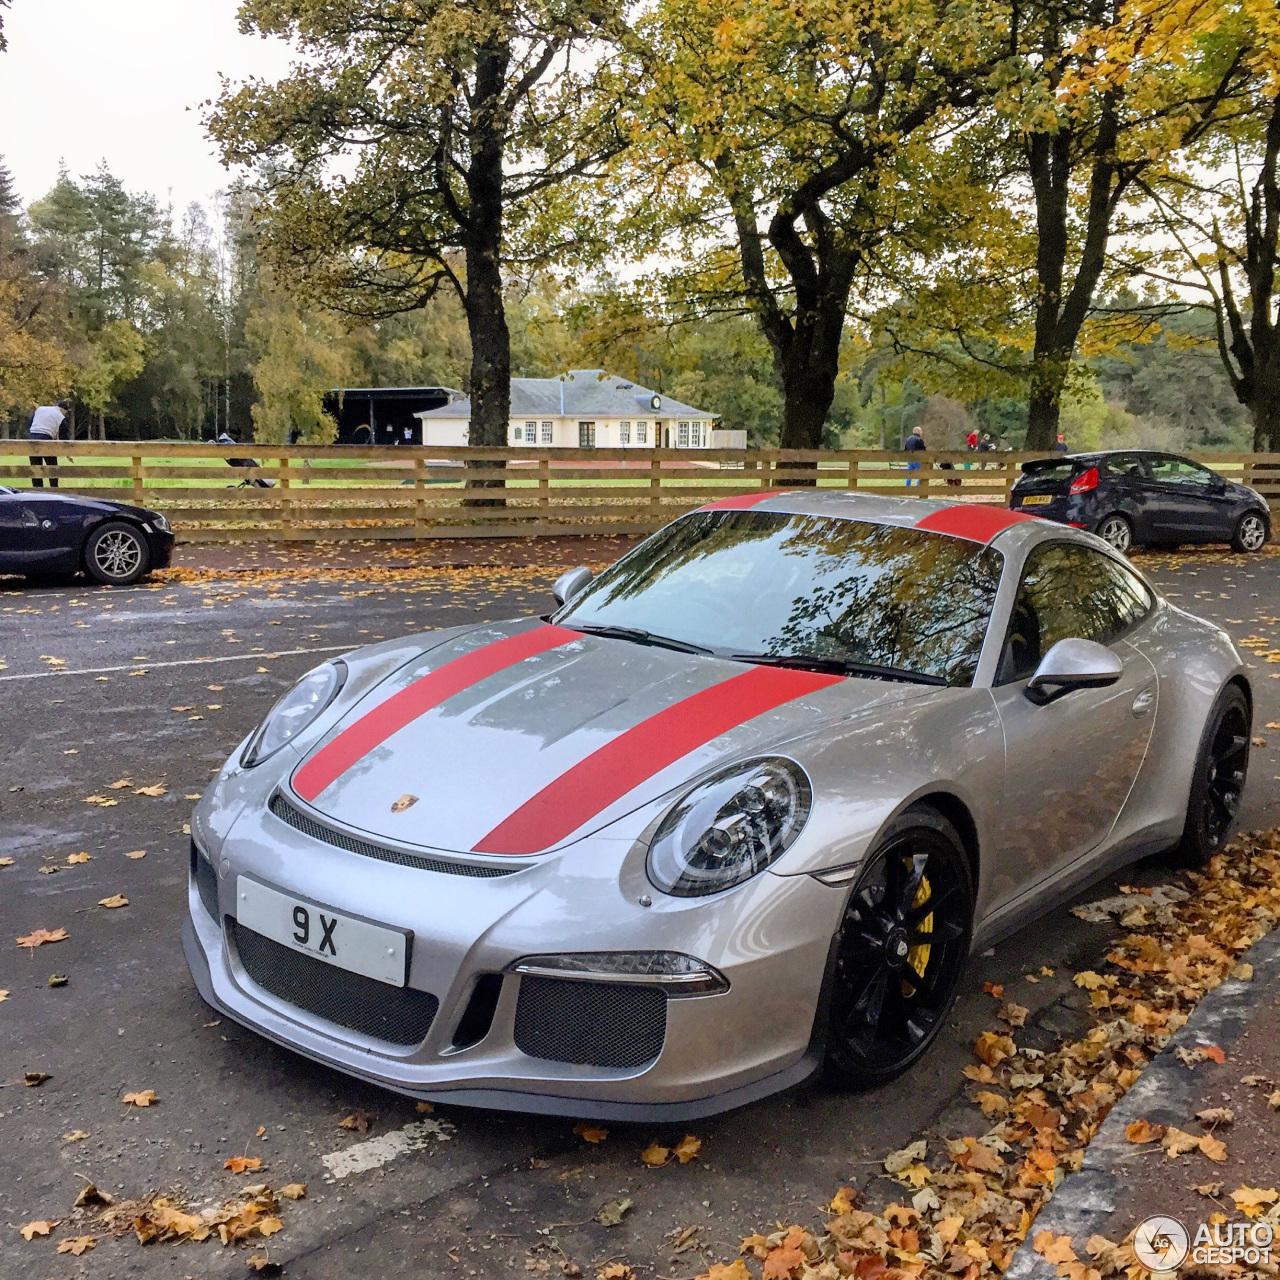 Porsche 911 2 7 Engine Weight: 6 February 2017